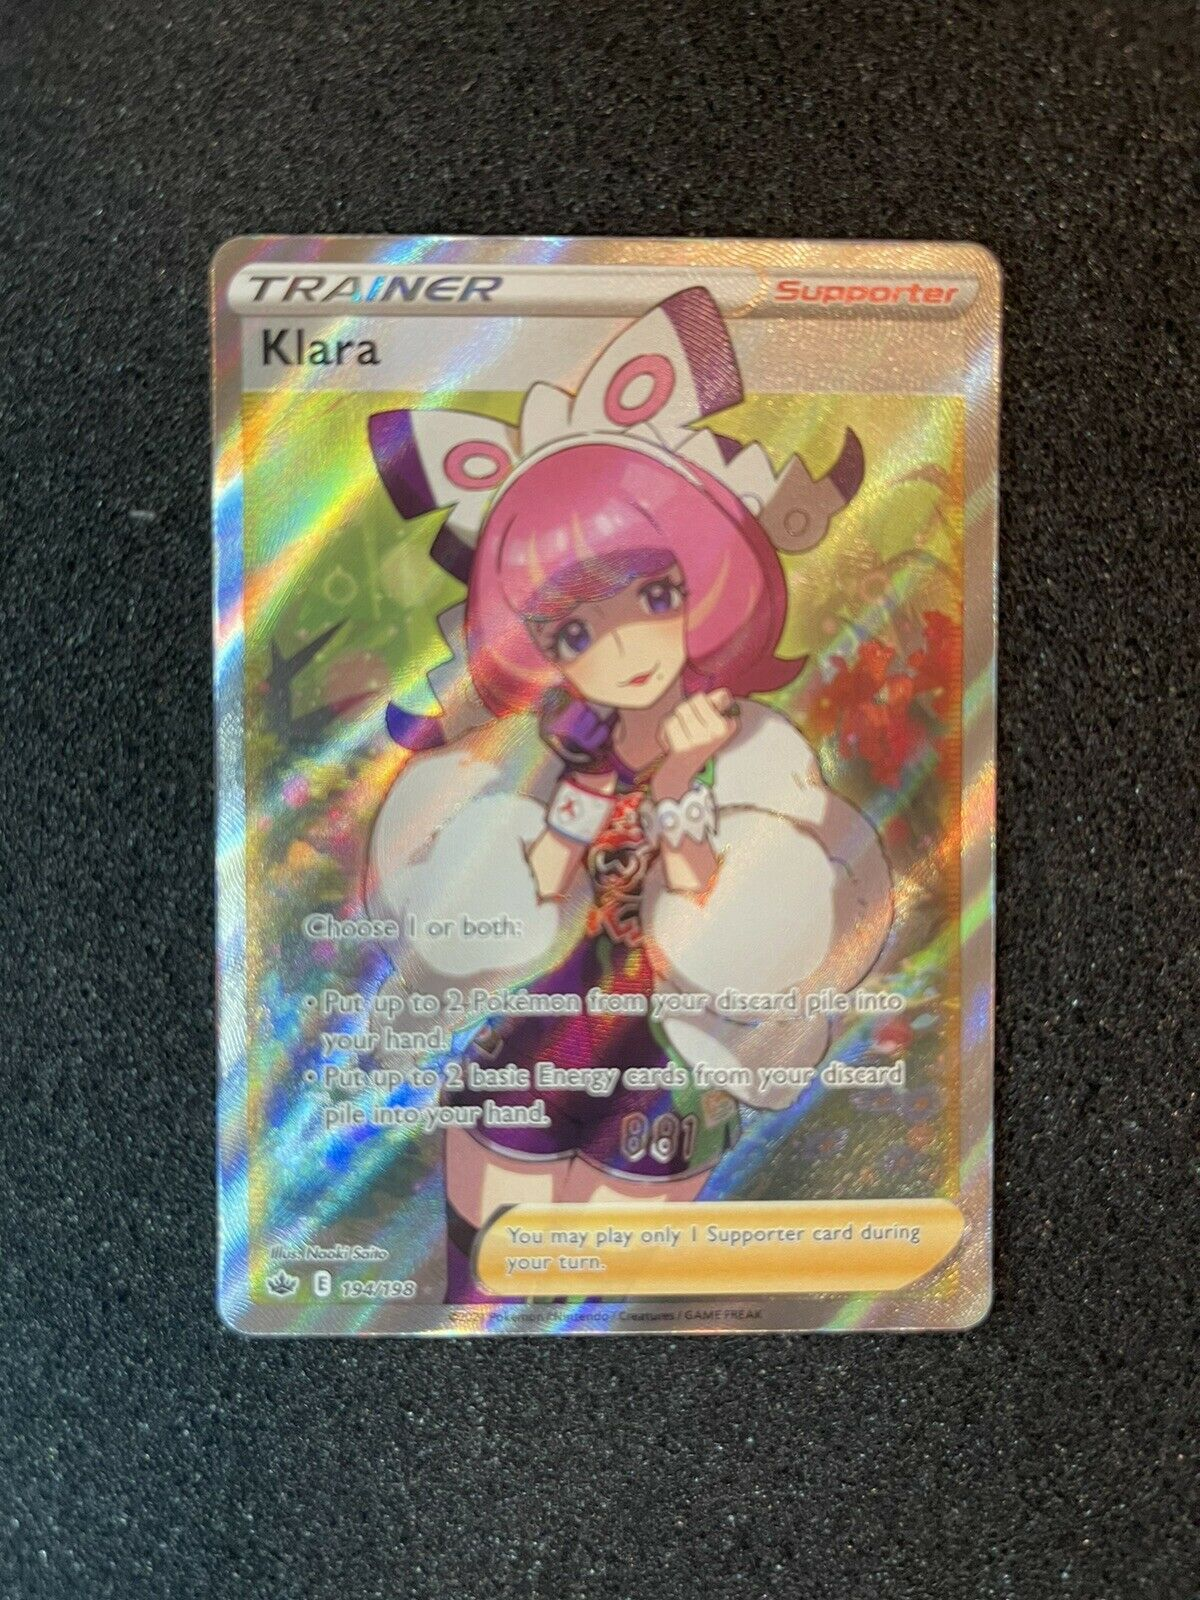 Pokémon Klara Trainer 194/198, Full Art Holo Rare, Chilling Reign